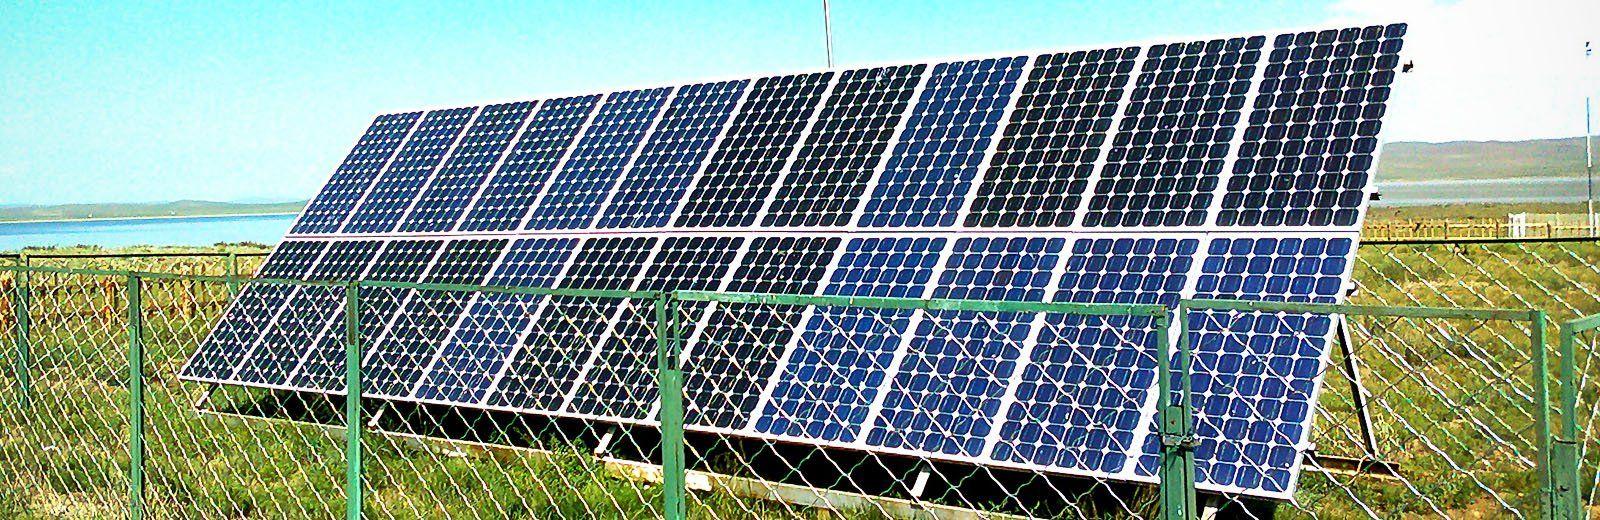 12 Best Diy Solar Panel Tutorials For The Frugal Homesteader Diy Solar Panel Solar Panels Diy Solar